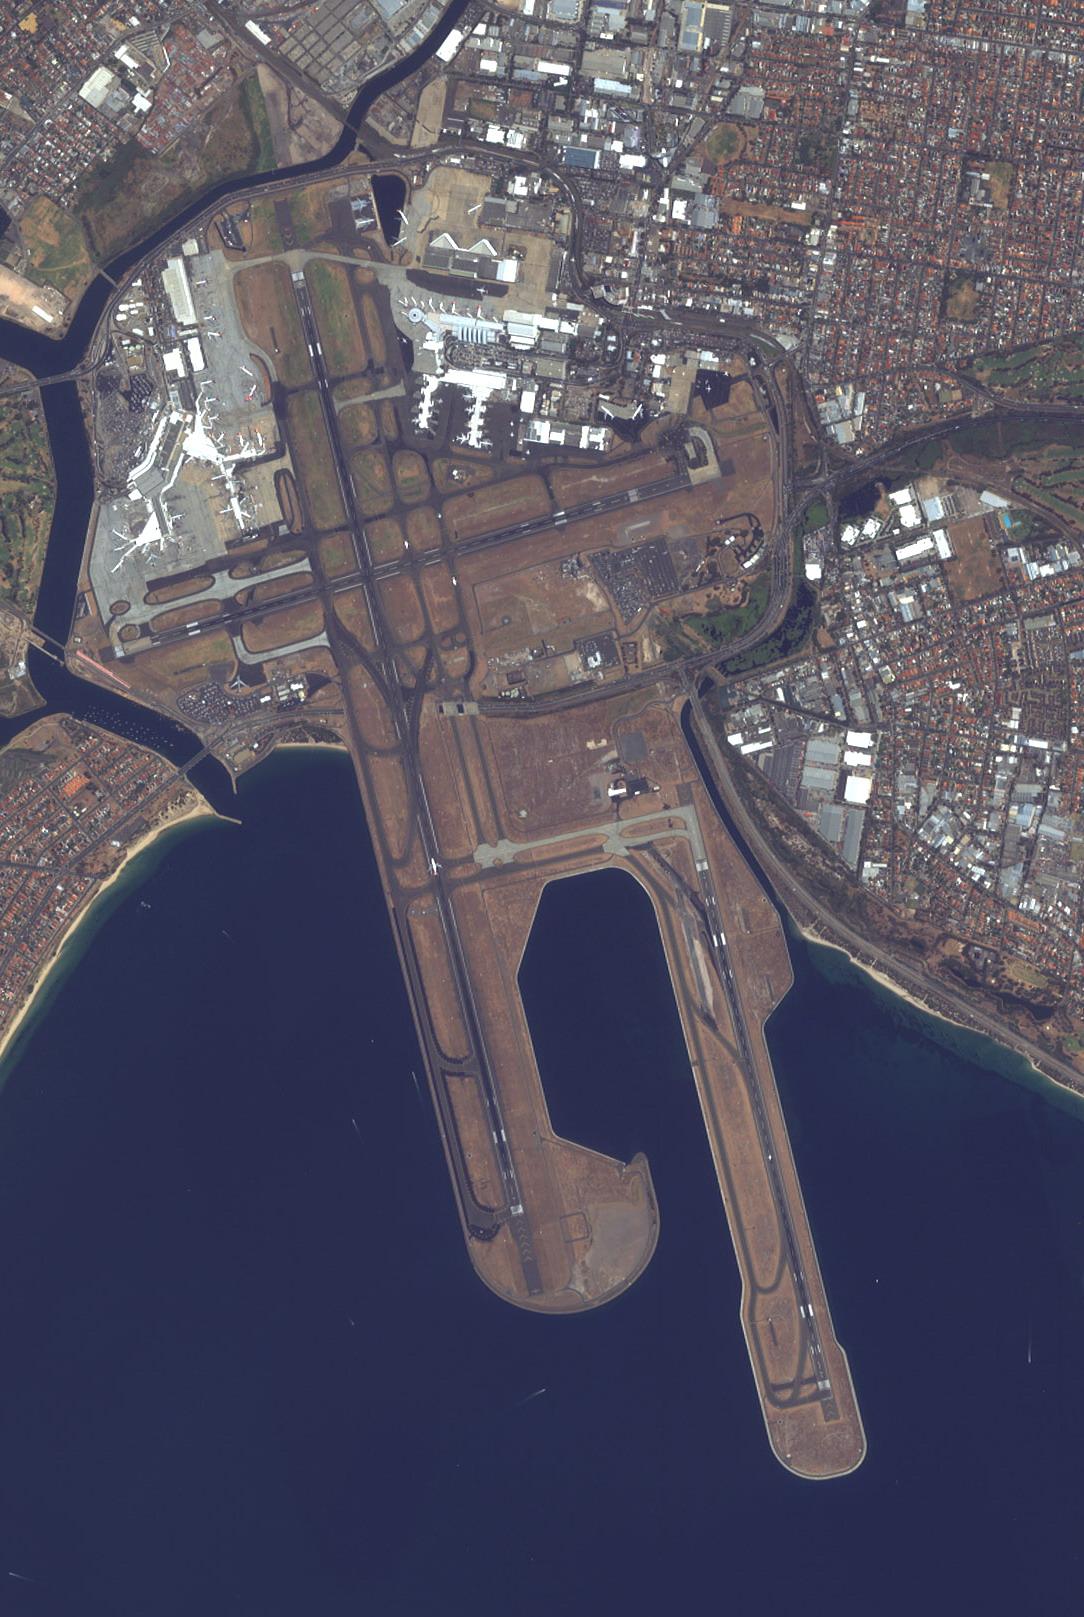 Depiction of Aeropuerto Internacional Kingsford Smith